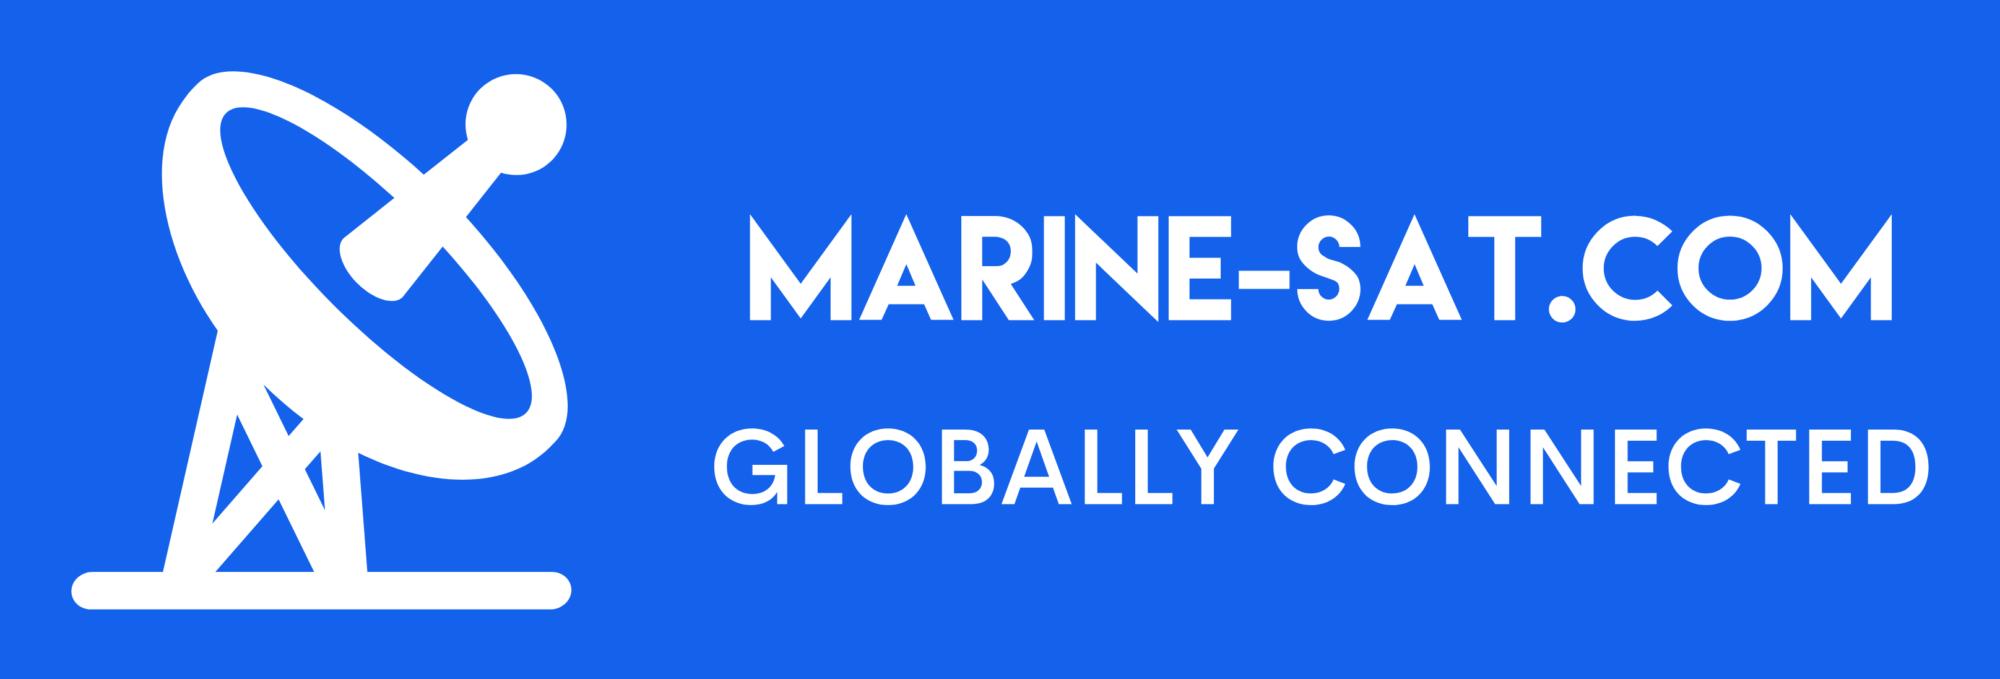 marine-sat.com